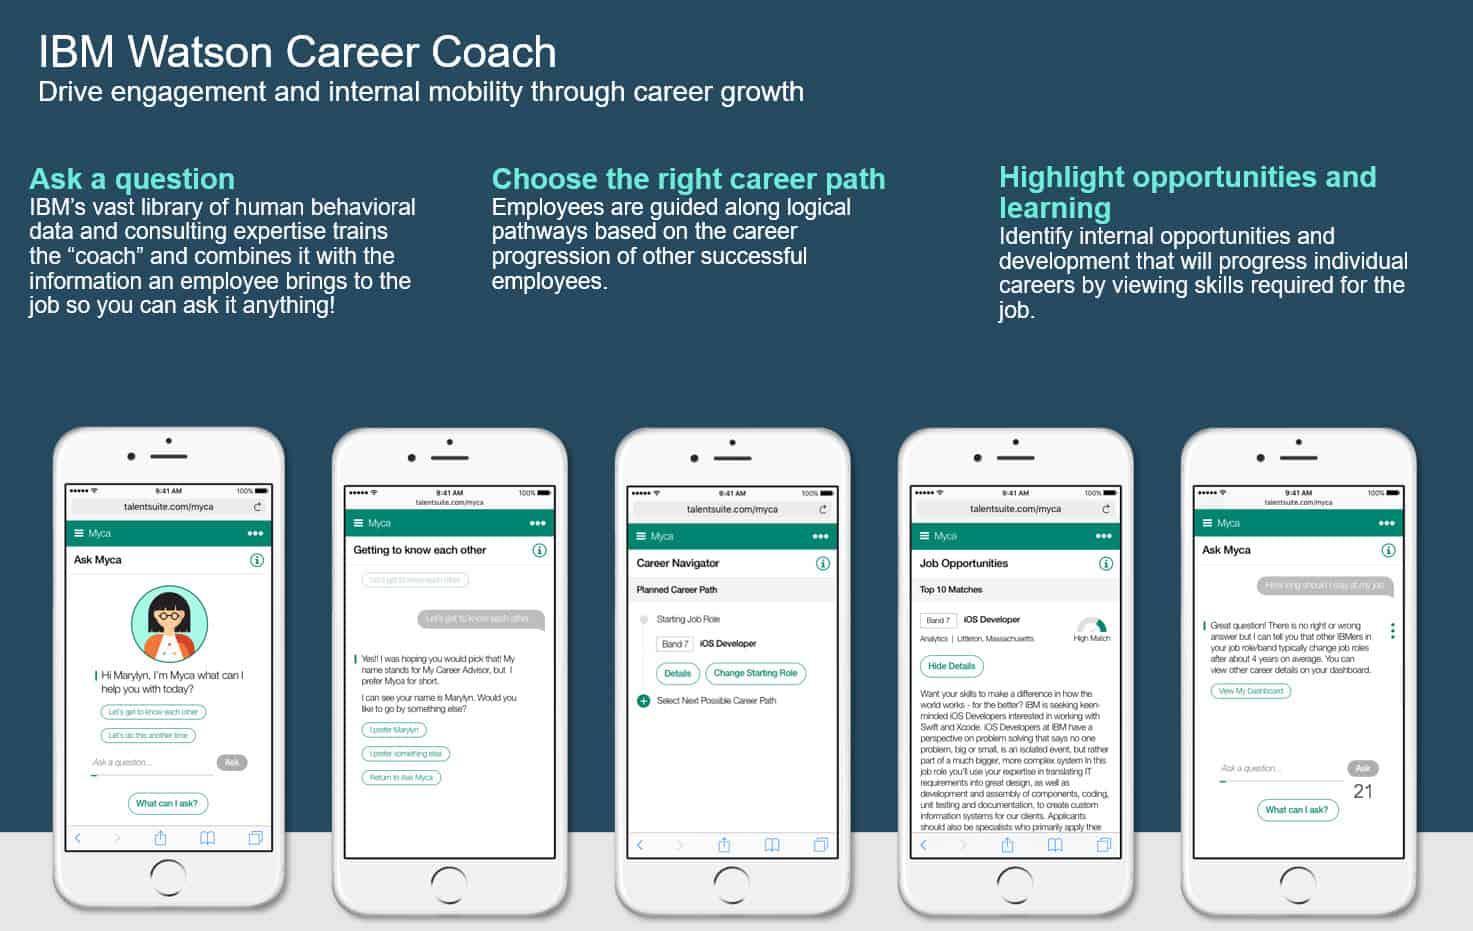 IBM Career Coach